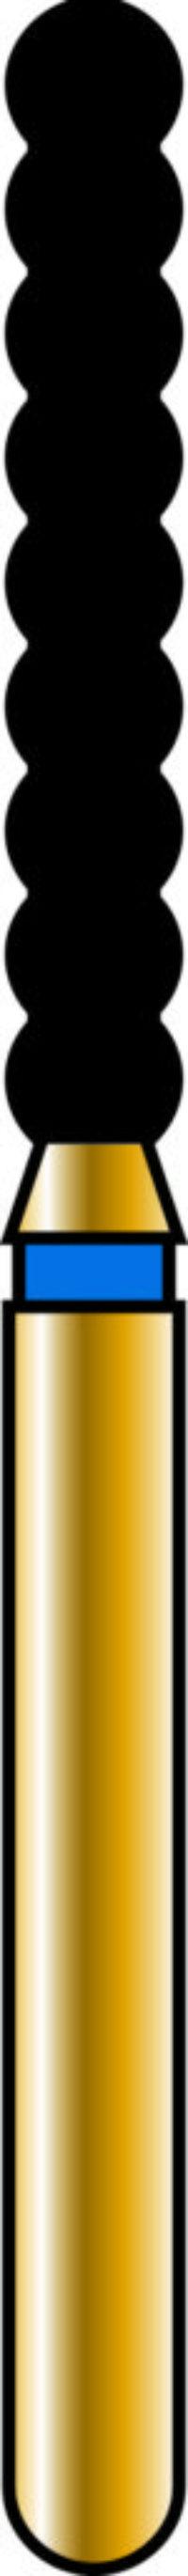 Cylinder 18-10mm Gold Diamond Bur